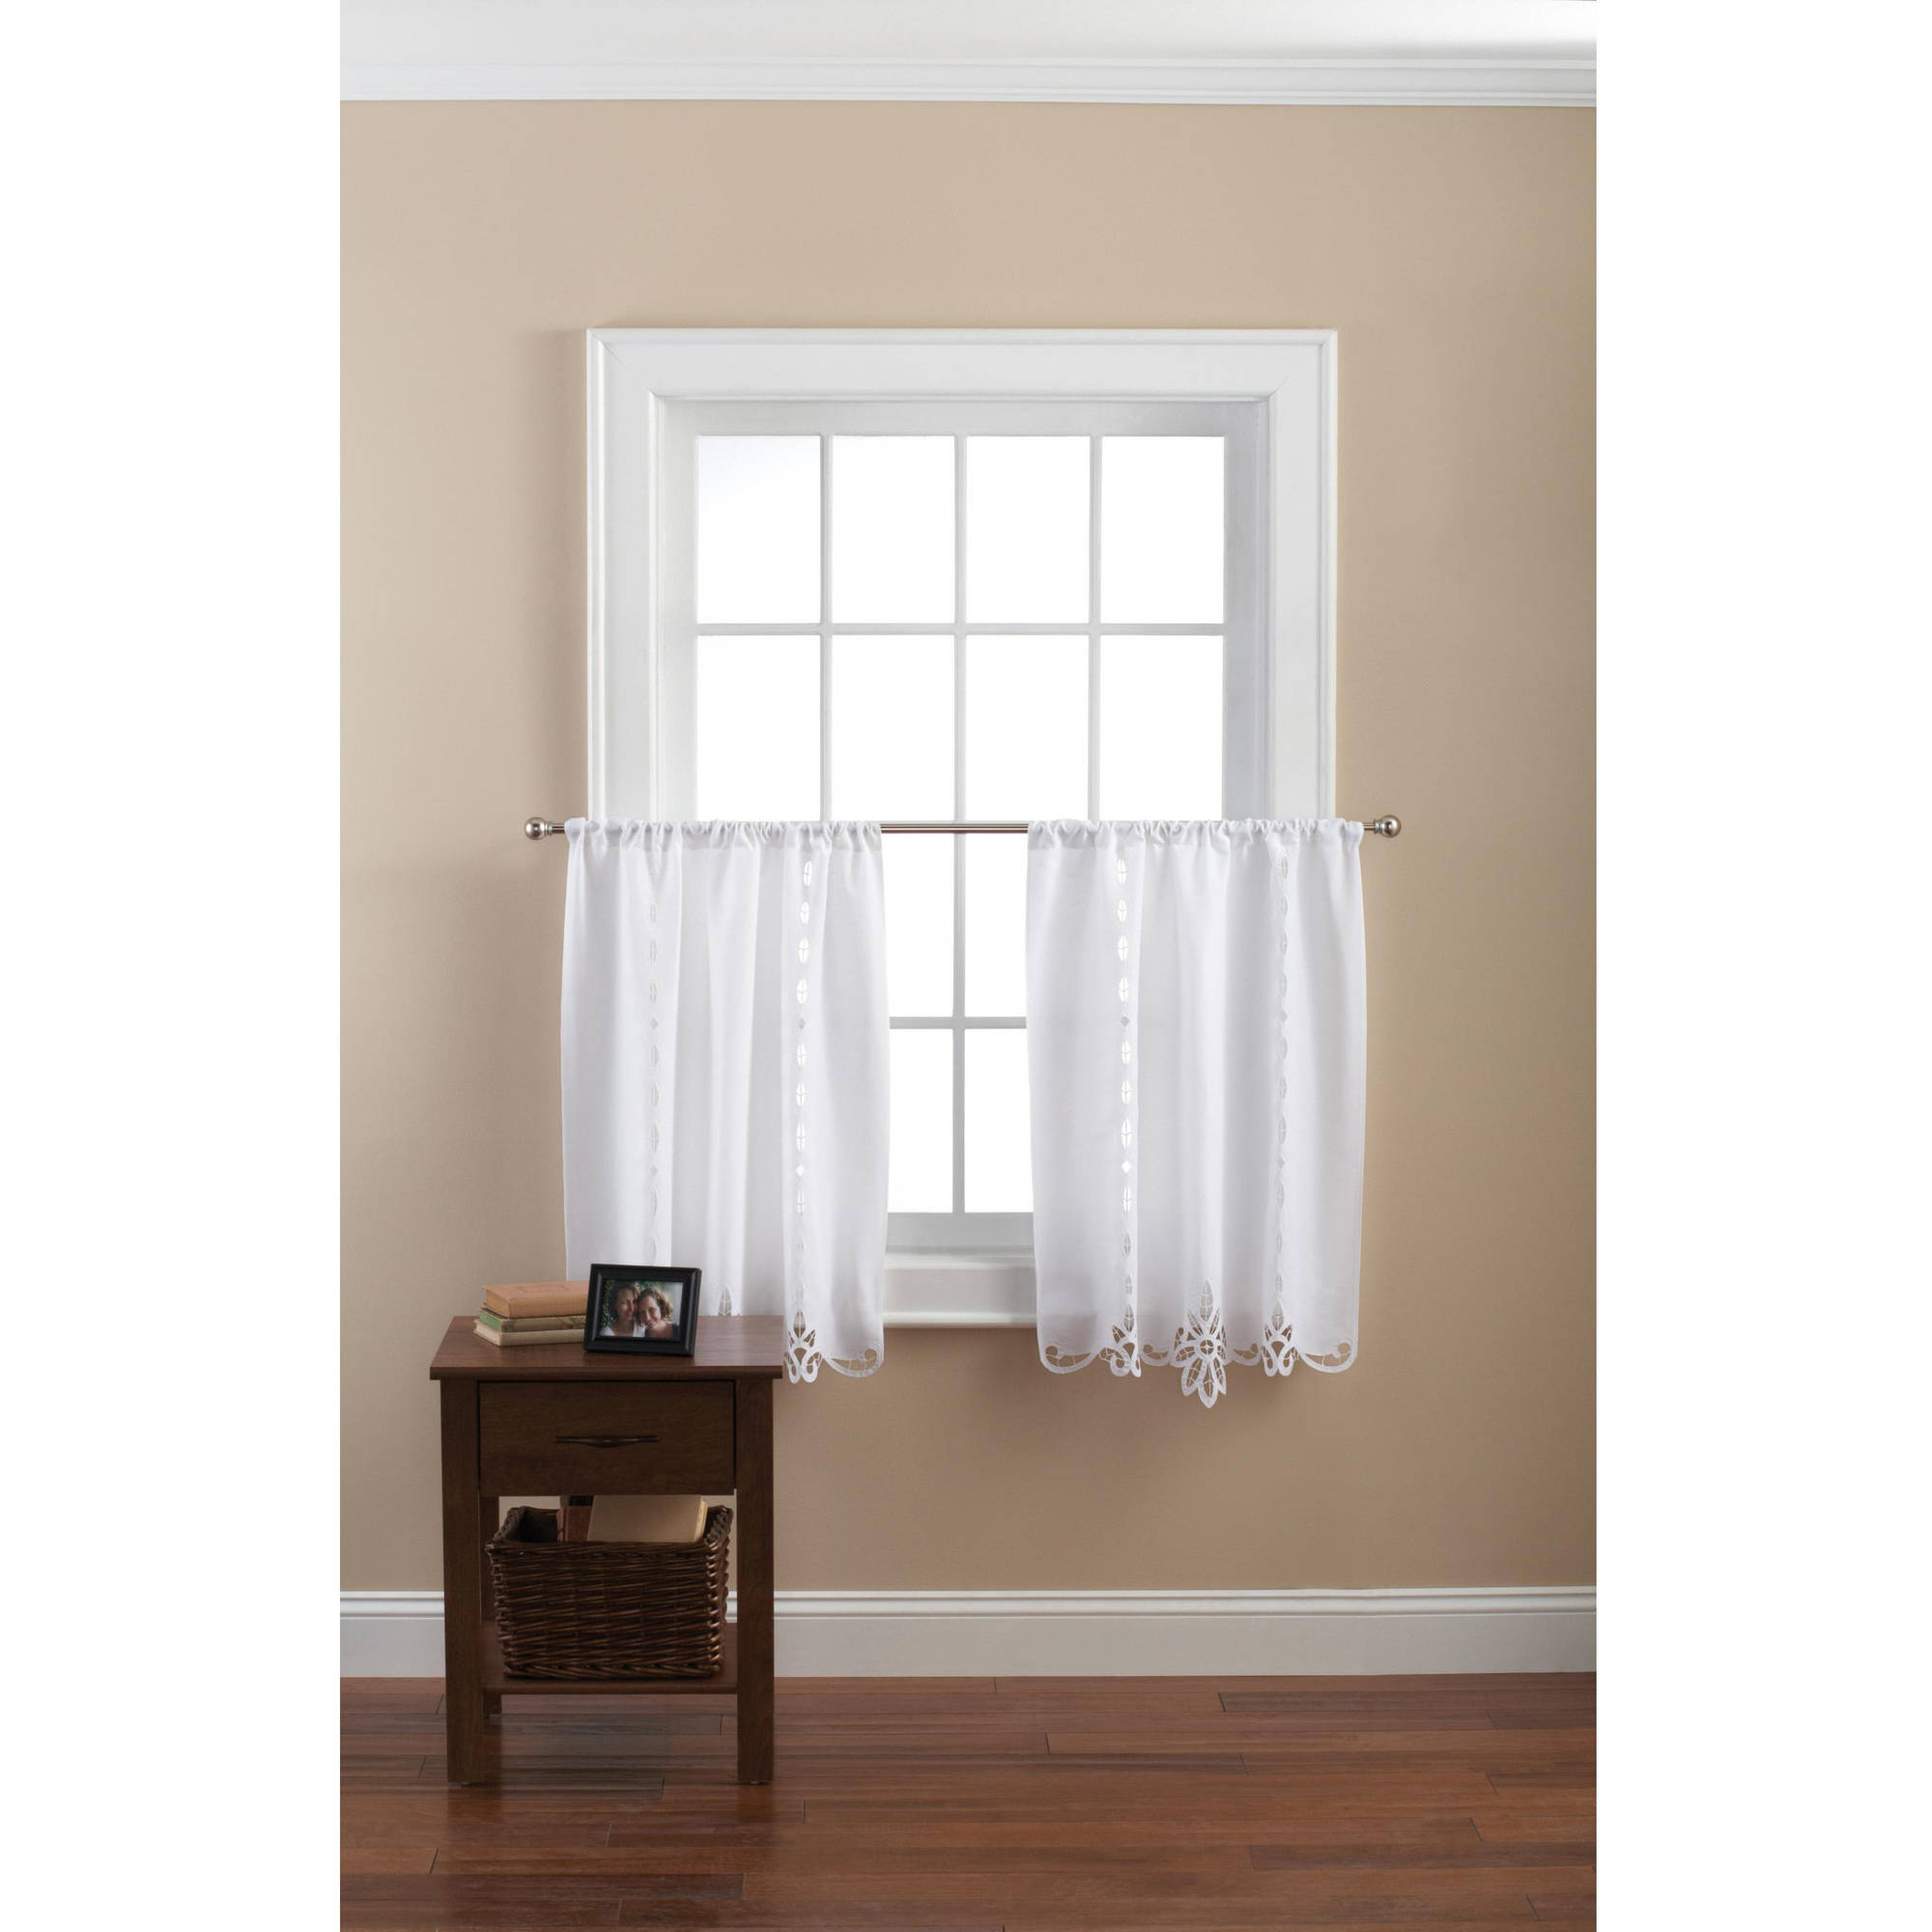 Mainstays Battenburg White Lace Kitchen Curtains, Set Of 2